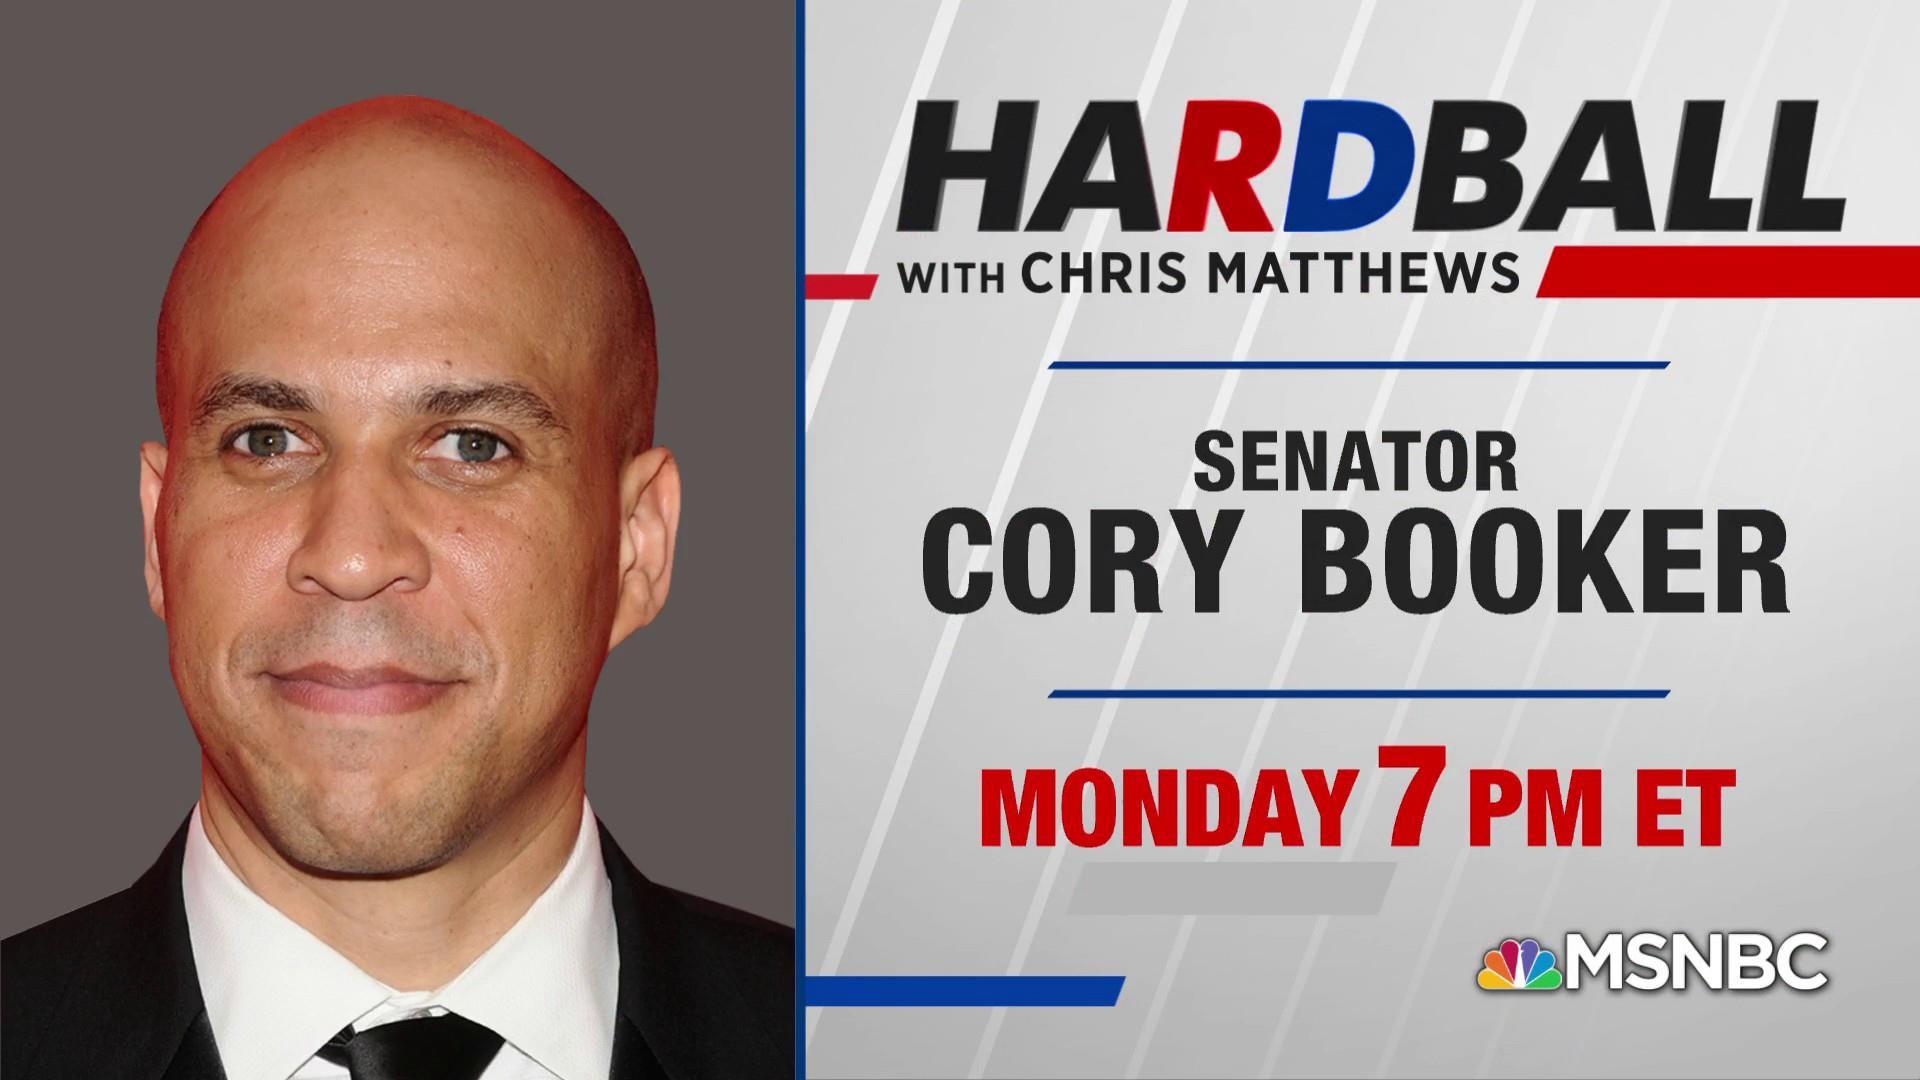 Sen. Cory Booker plays Hardball on Monday